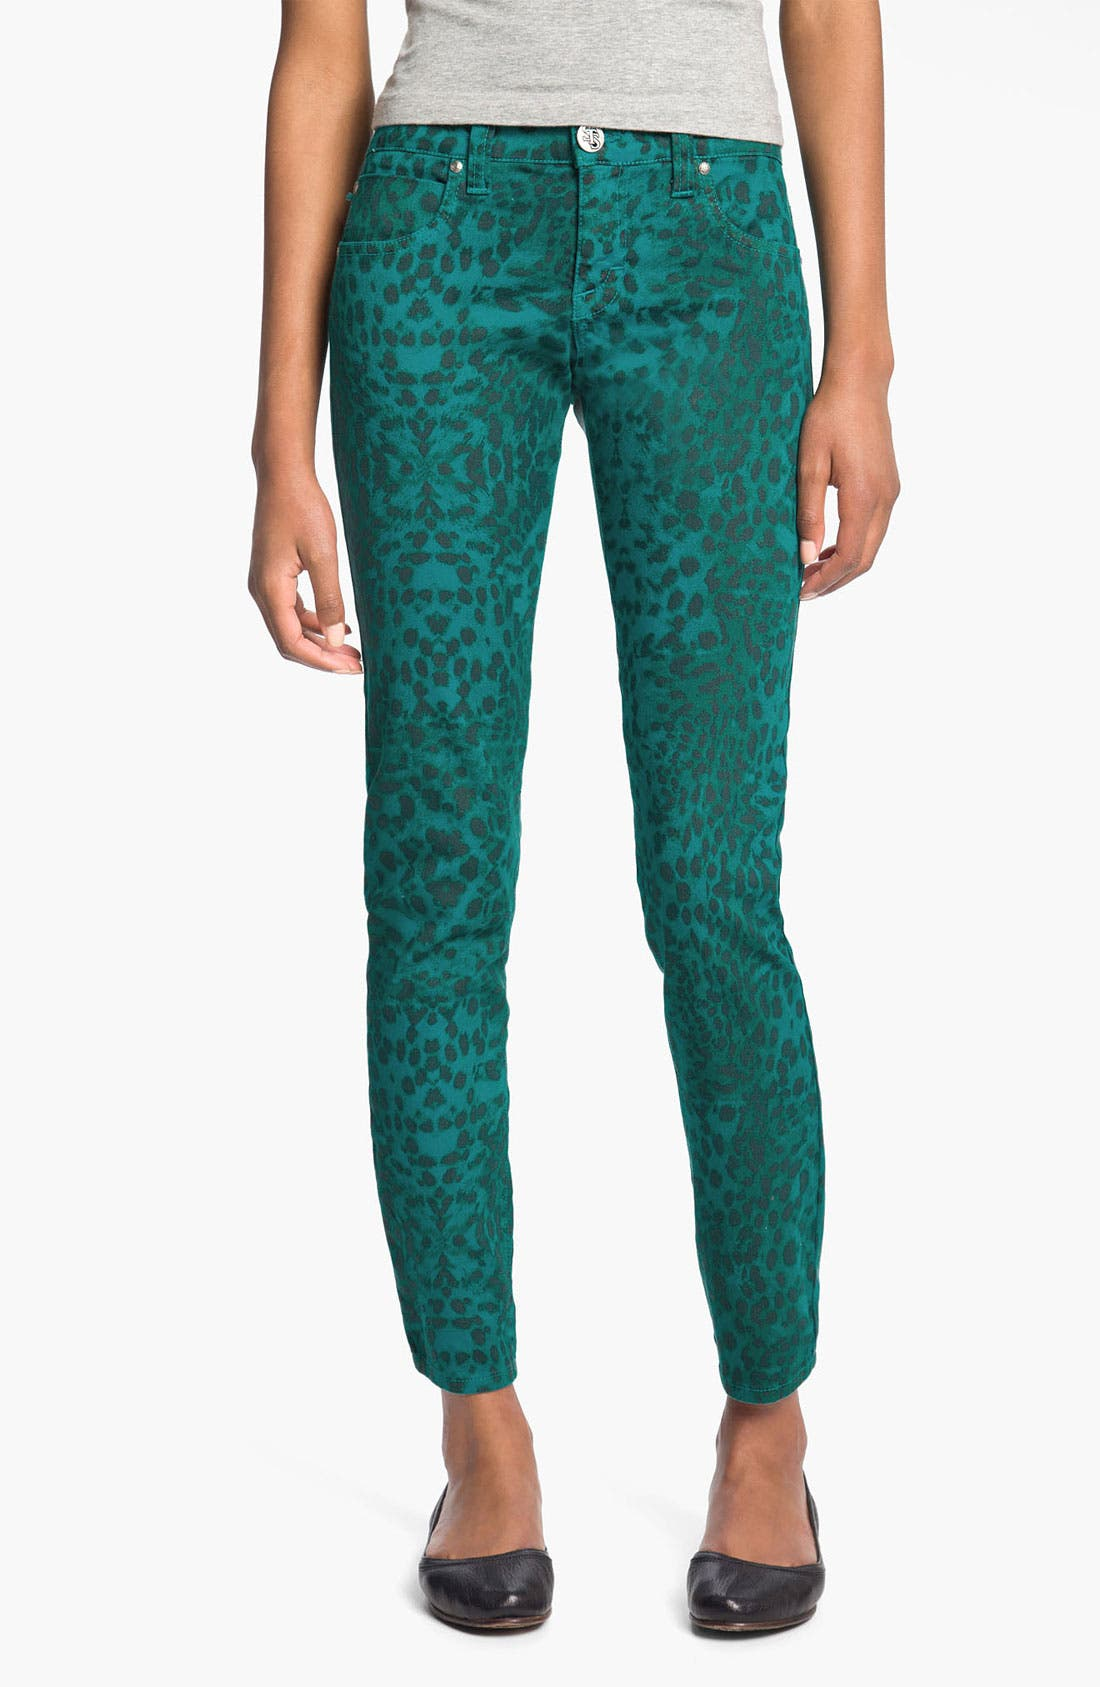 Alternate Image 1 Selected - See Thru Soul 'Fame' Animal Print Skinny Jeans (Juniors)